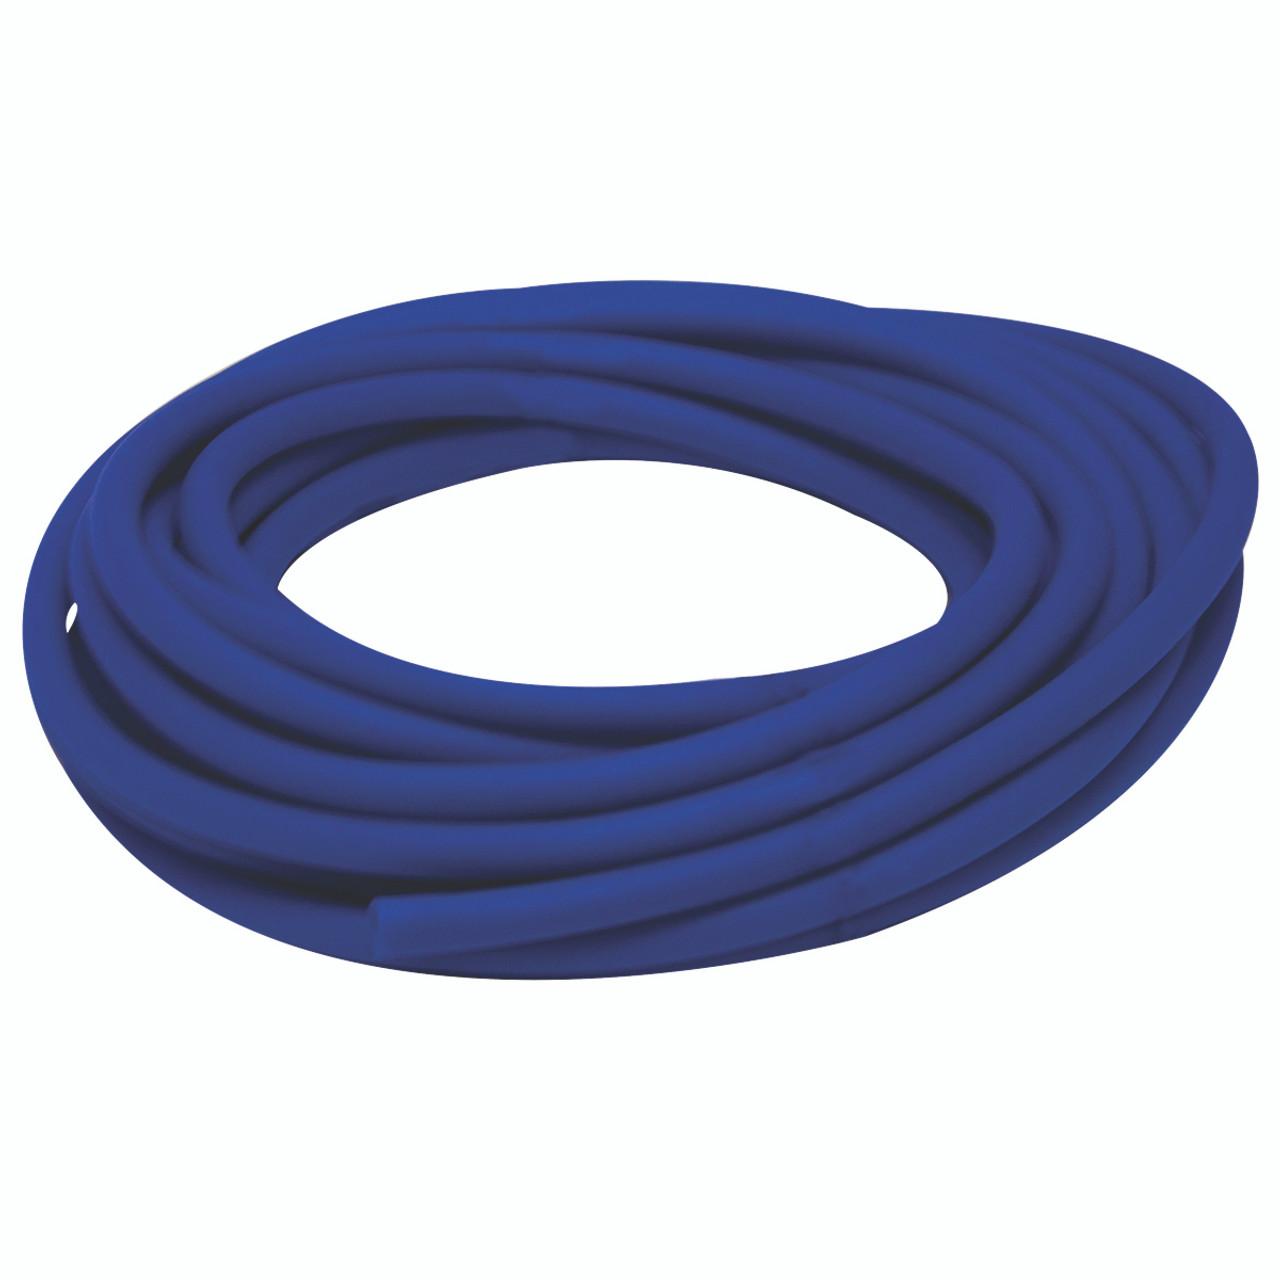 Sup-R Tubing¨ - Latex Free Exercise Tubing - 25' roll - Blue - heavy